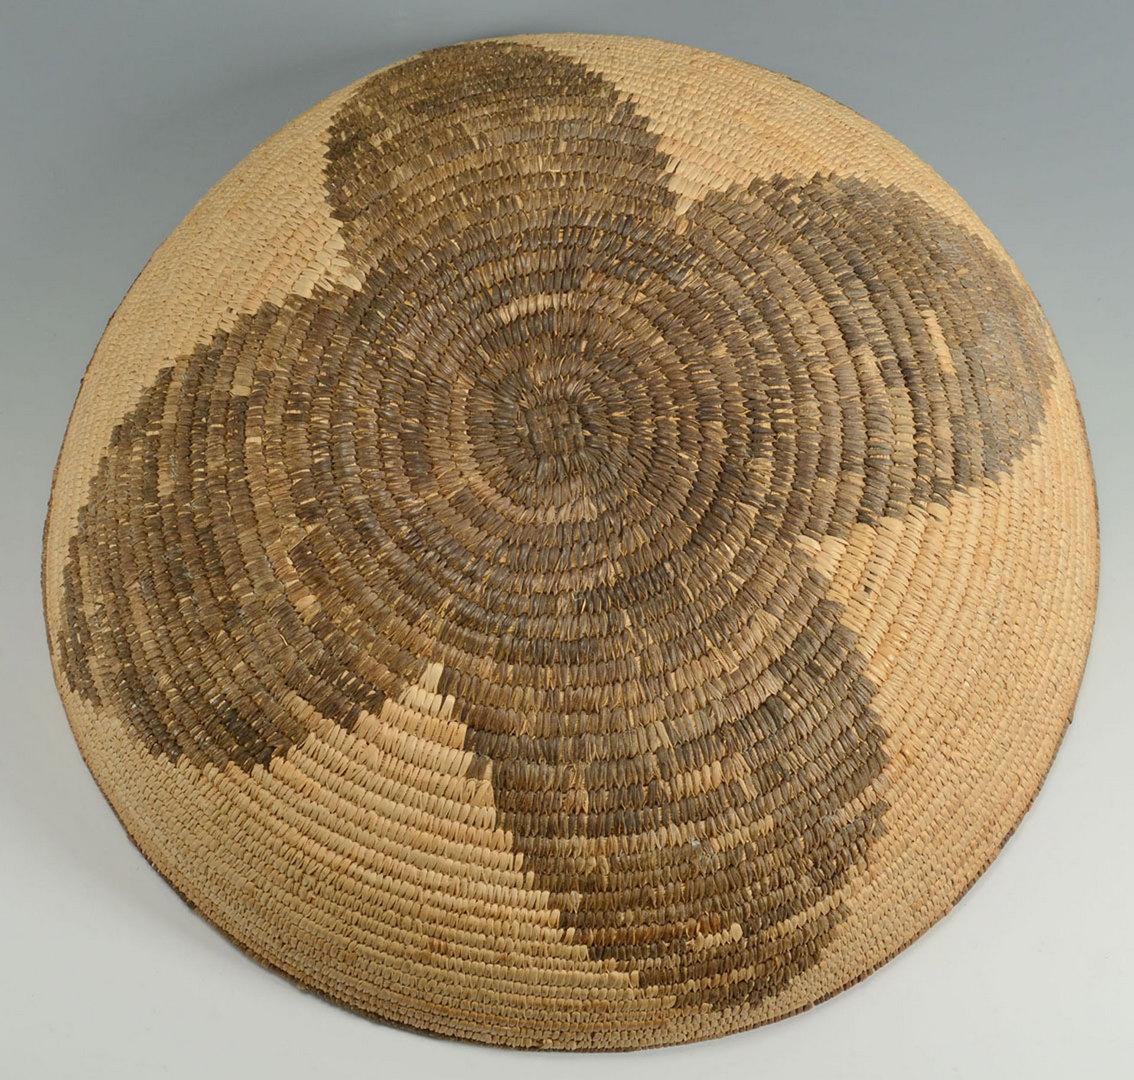 Lot 393: Native American Basket, poss. Apache or Pima